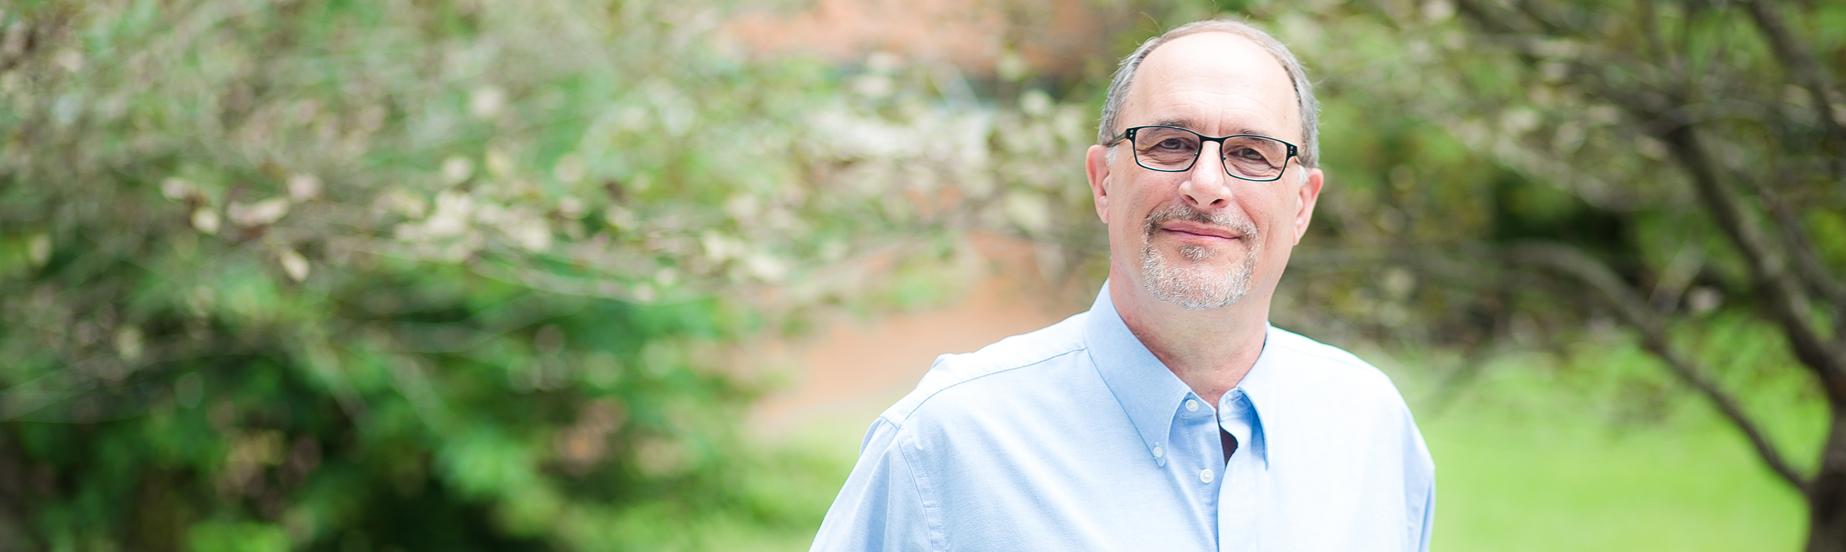 Header Portrait Dr. Bob Trigiano